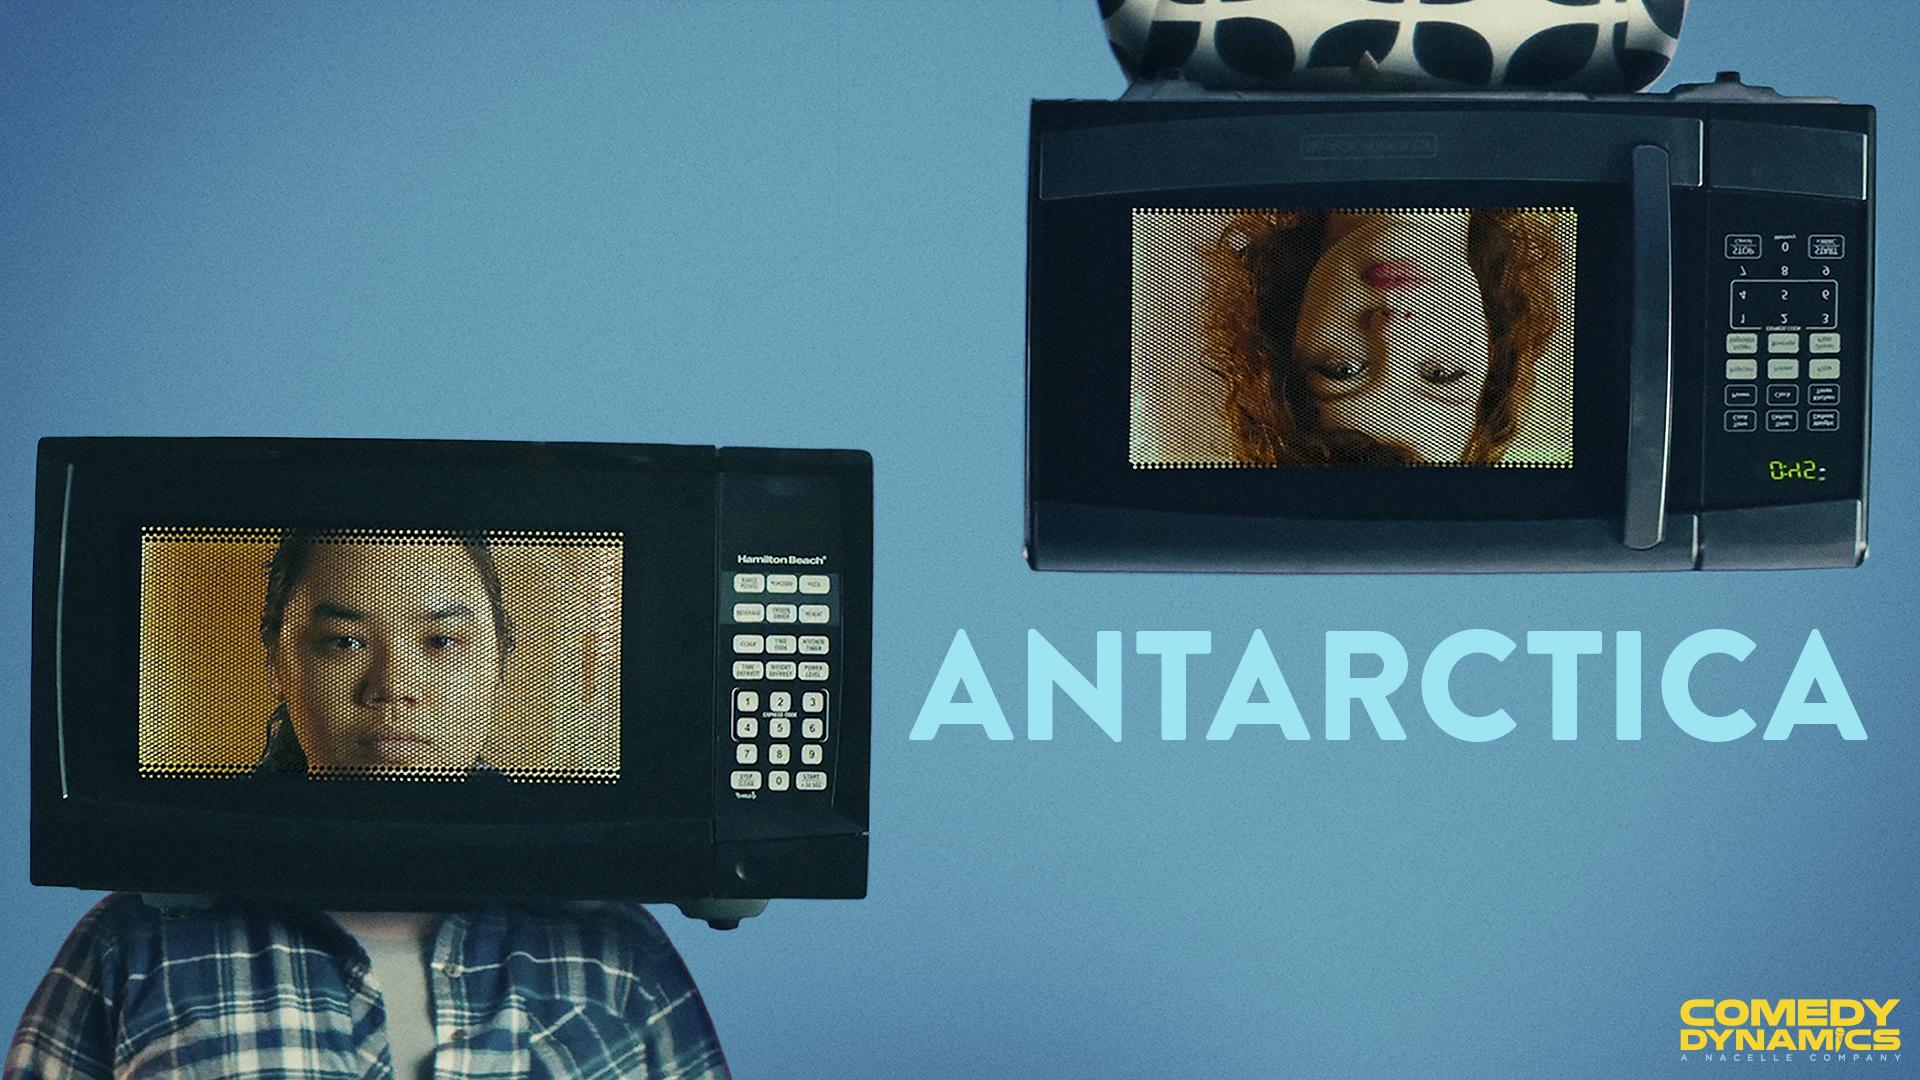 Antartica_Amazon_1920x1080